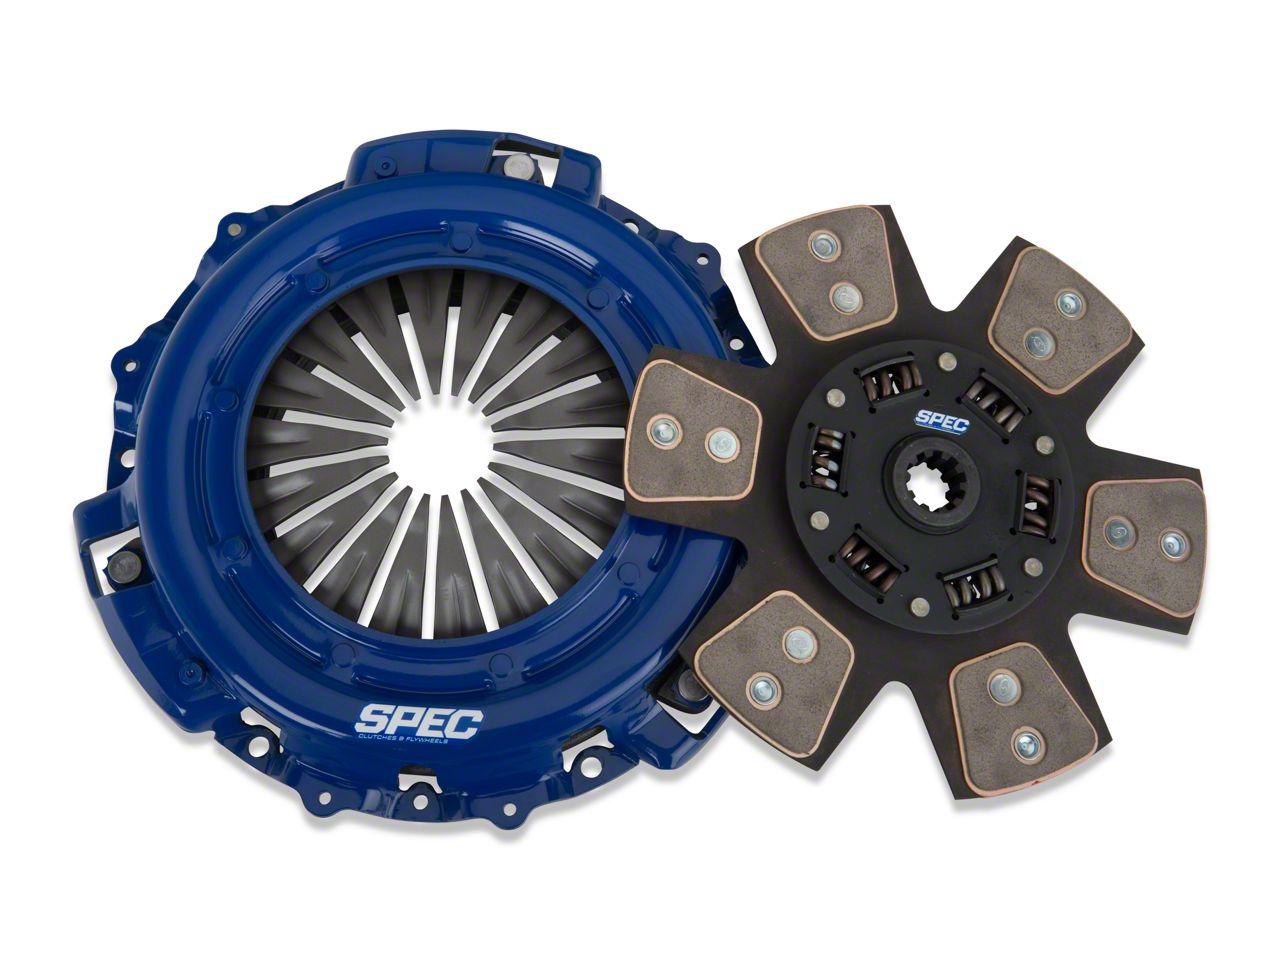 Spec Stage 3 Clutch (86-Mid 01 GT; 93-98 Cobra)